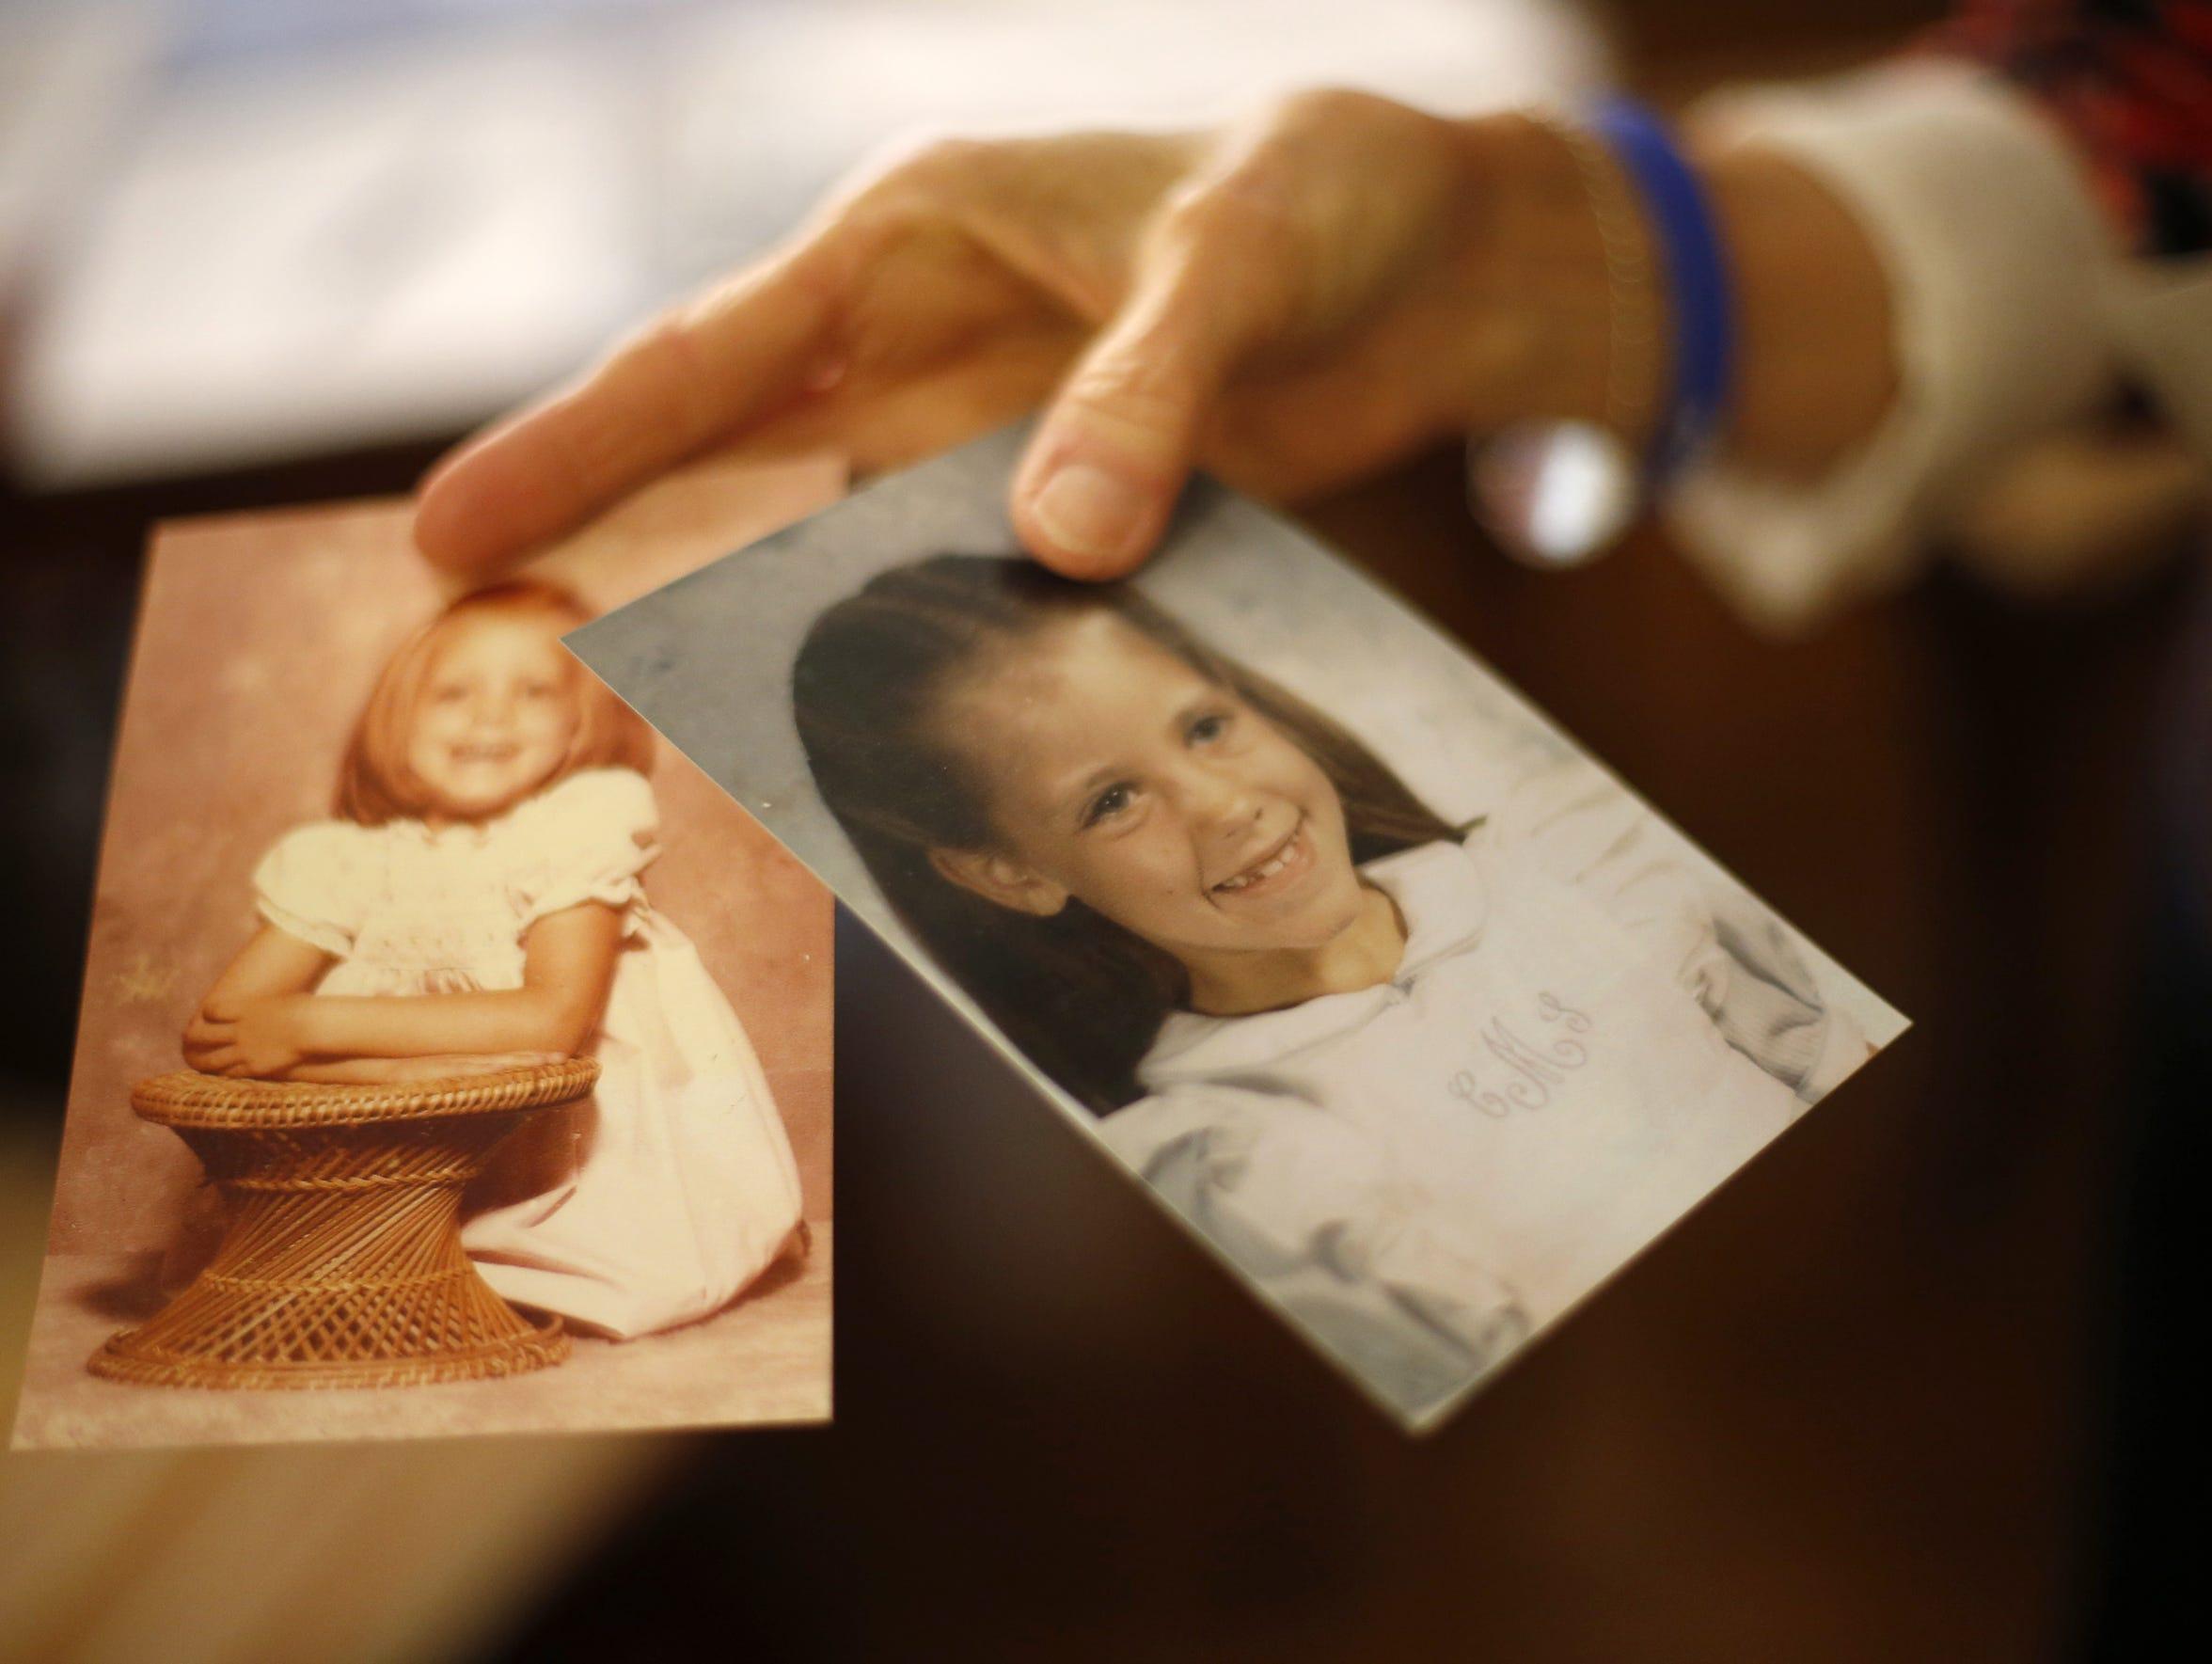 Karen McGehee holds old photos of her daughter Caroline